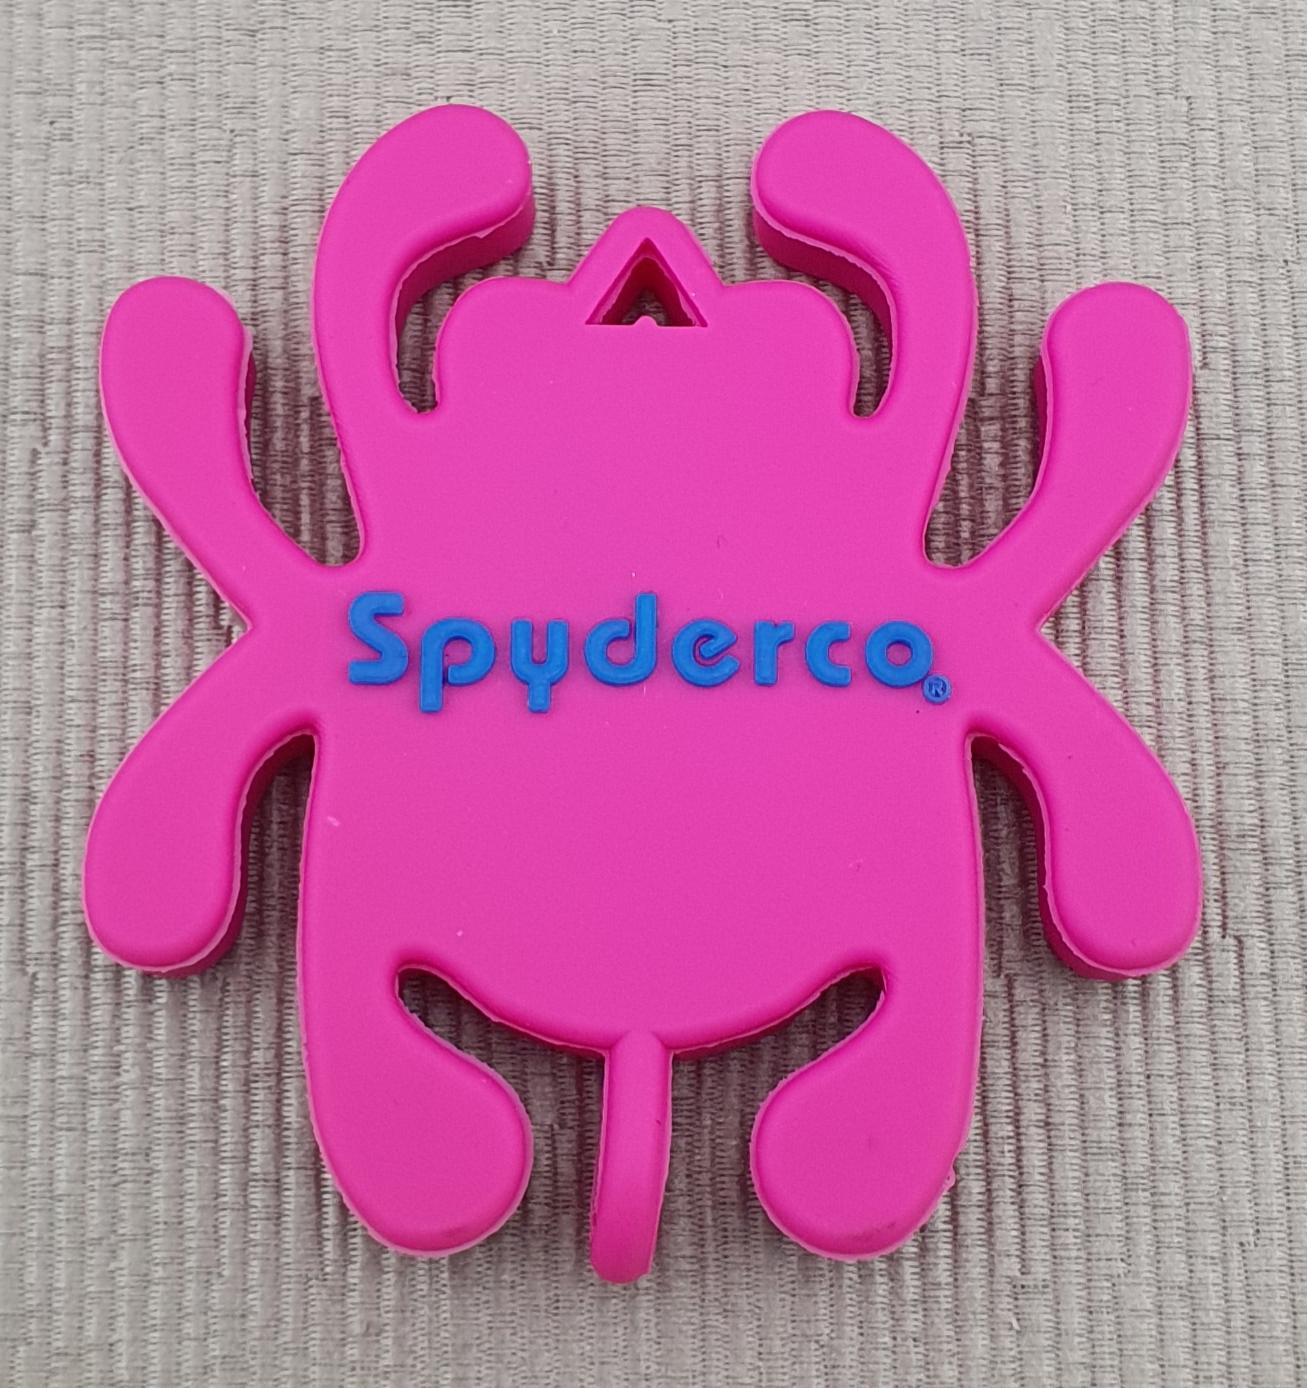 Spyderco Flashdrive pink